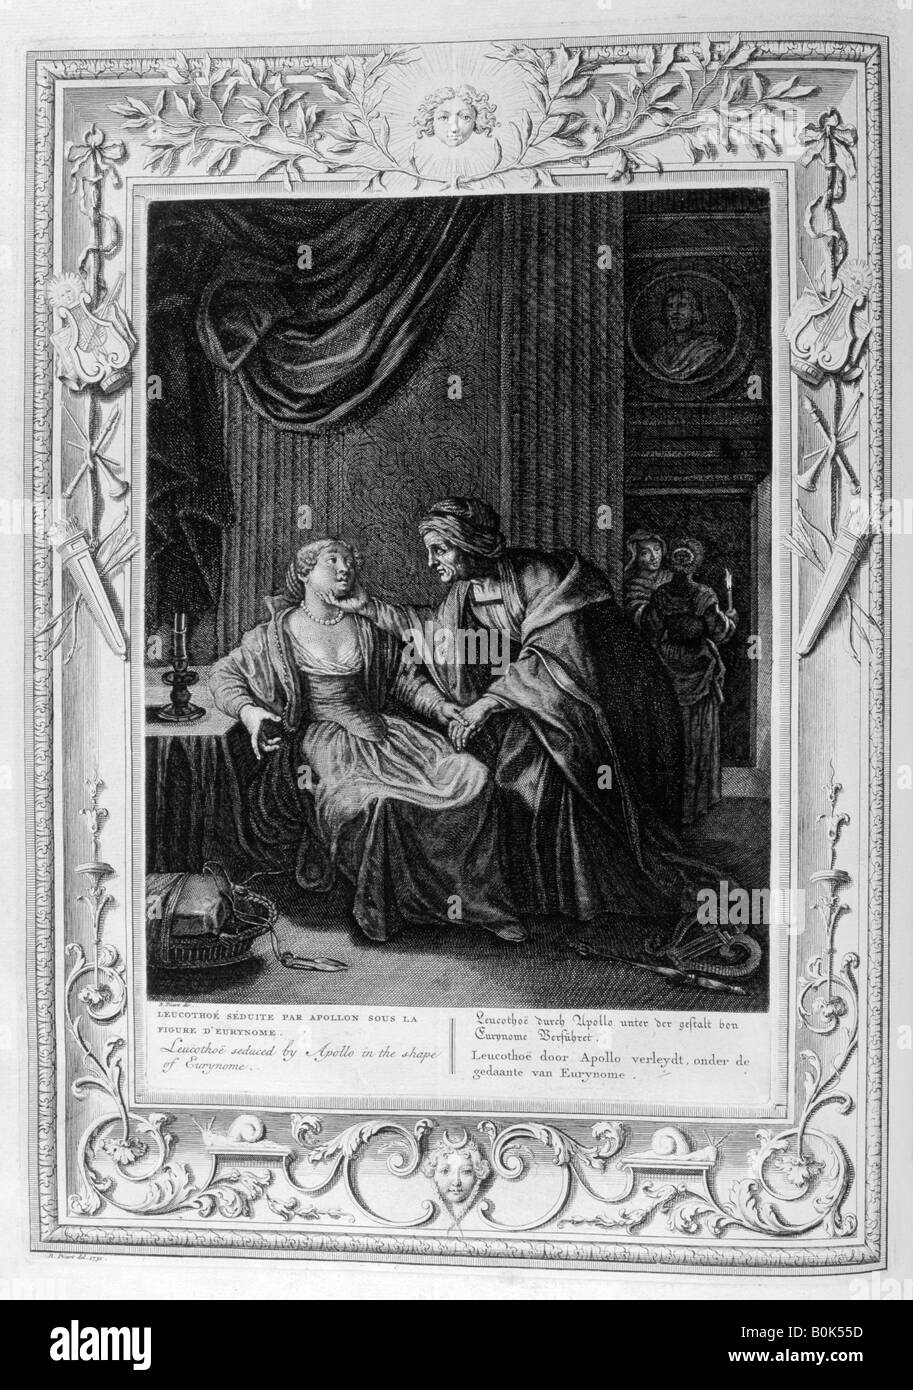 'Leucothoe Seduced by Apollo in the Shape of Eurynome', 1733. Artist: Bernard Picart - Stock Image